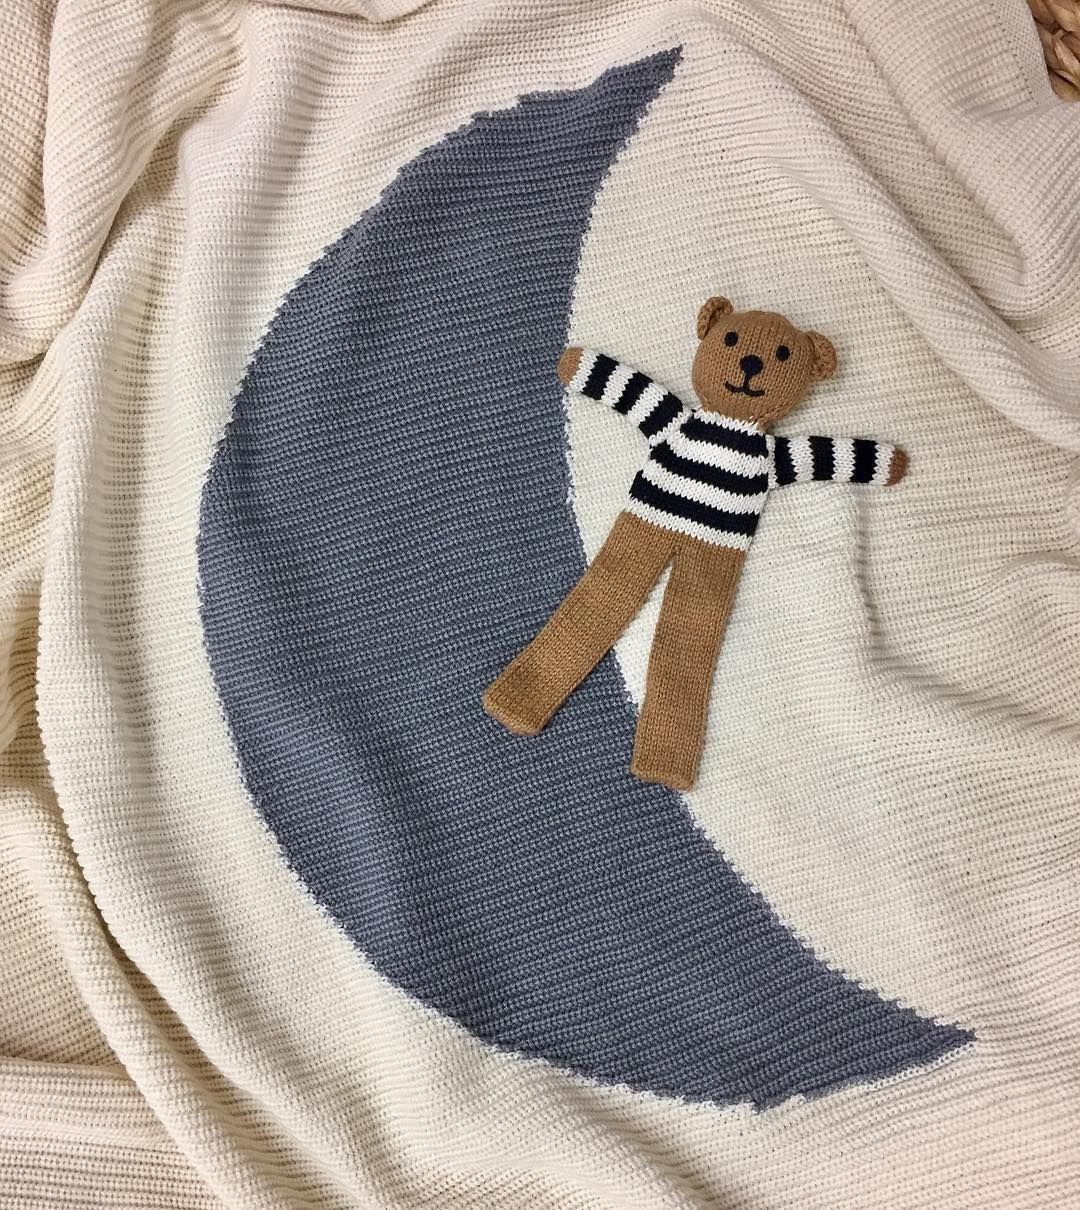 Cotton Baby Blanket Moon Cotton Baby Blankets Cotton Blankets Blanket